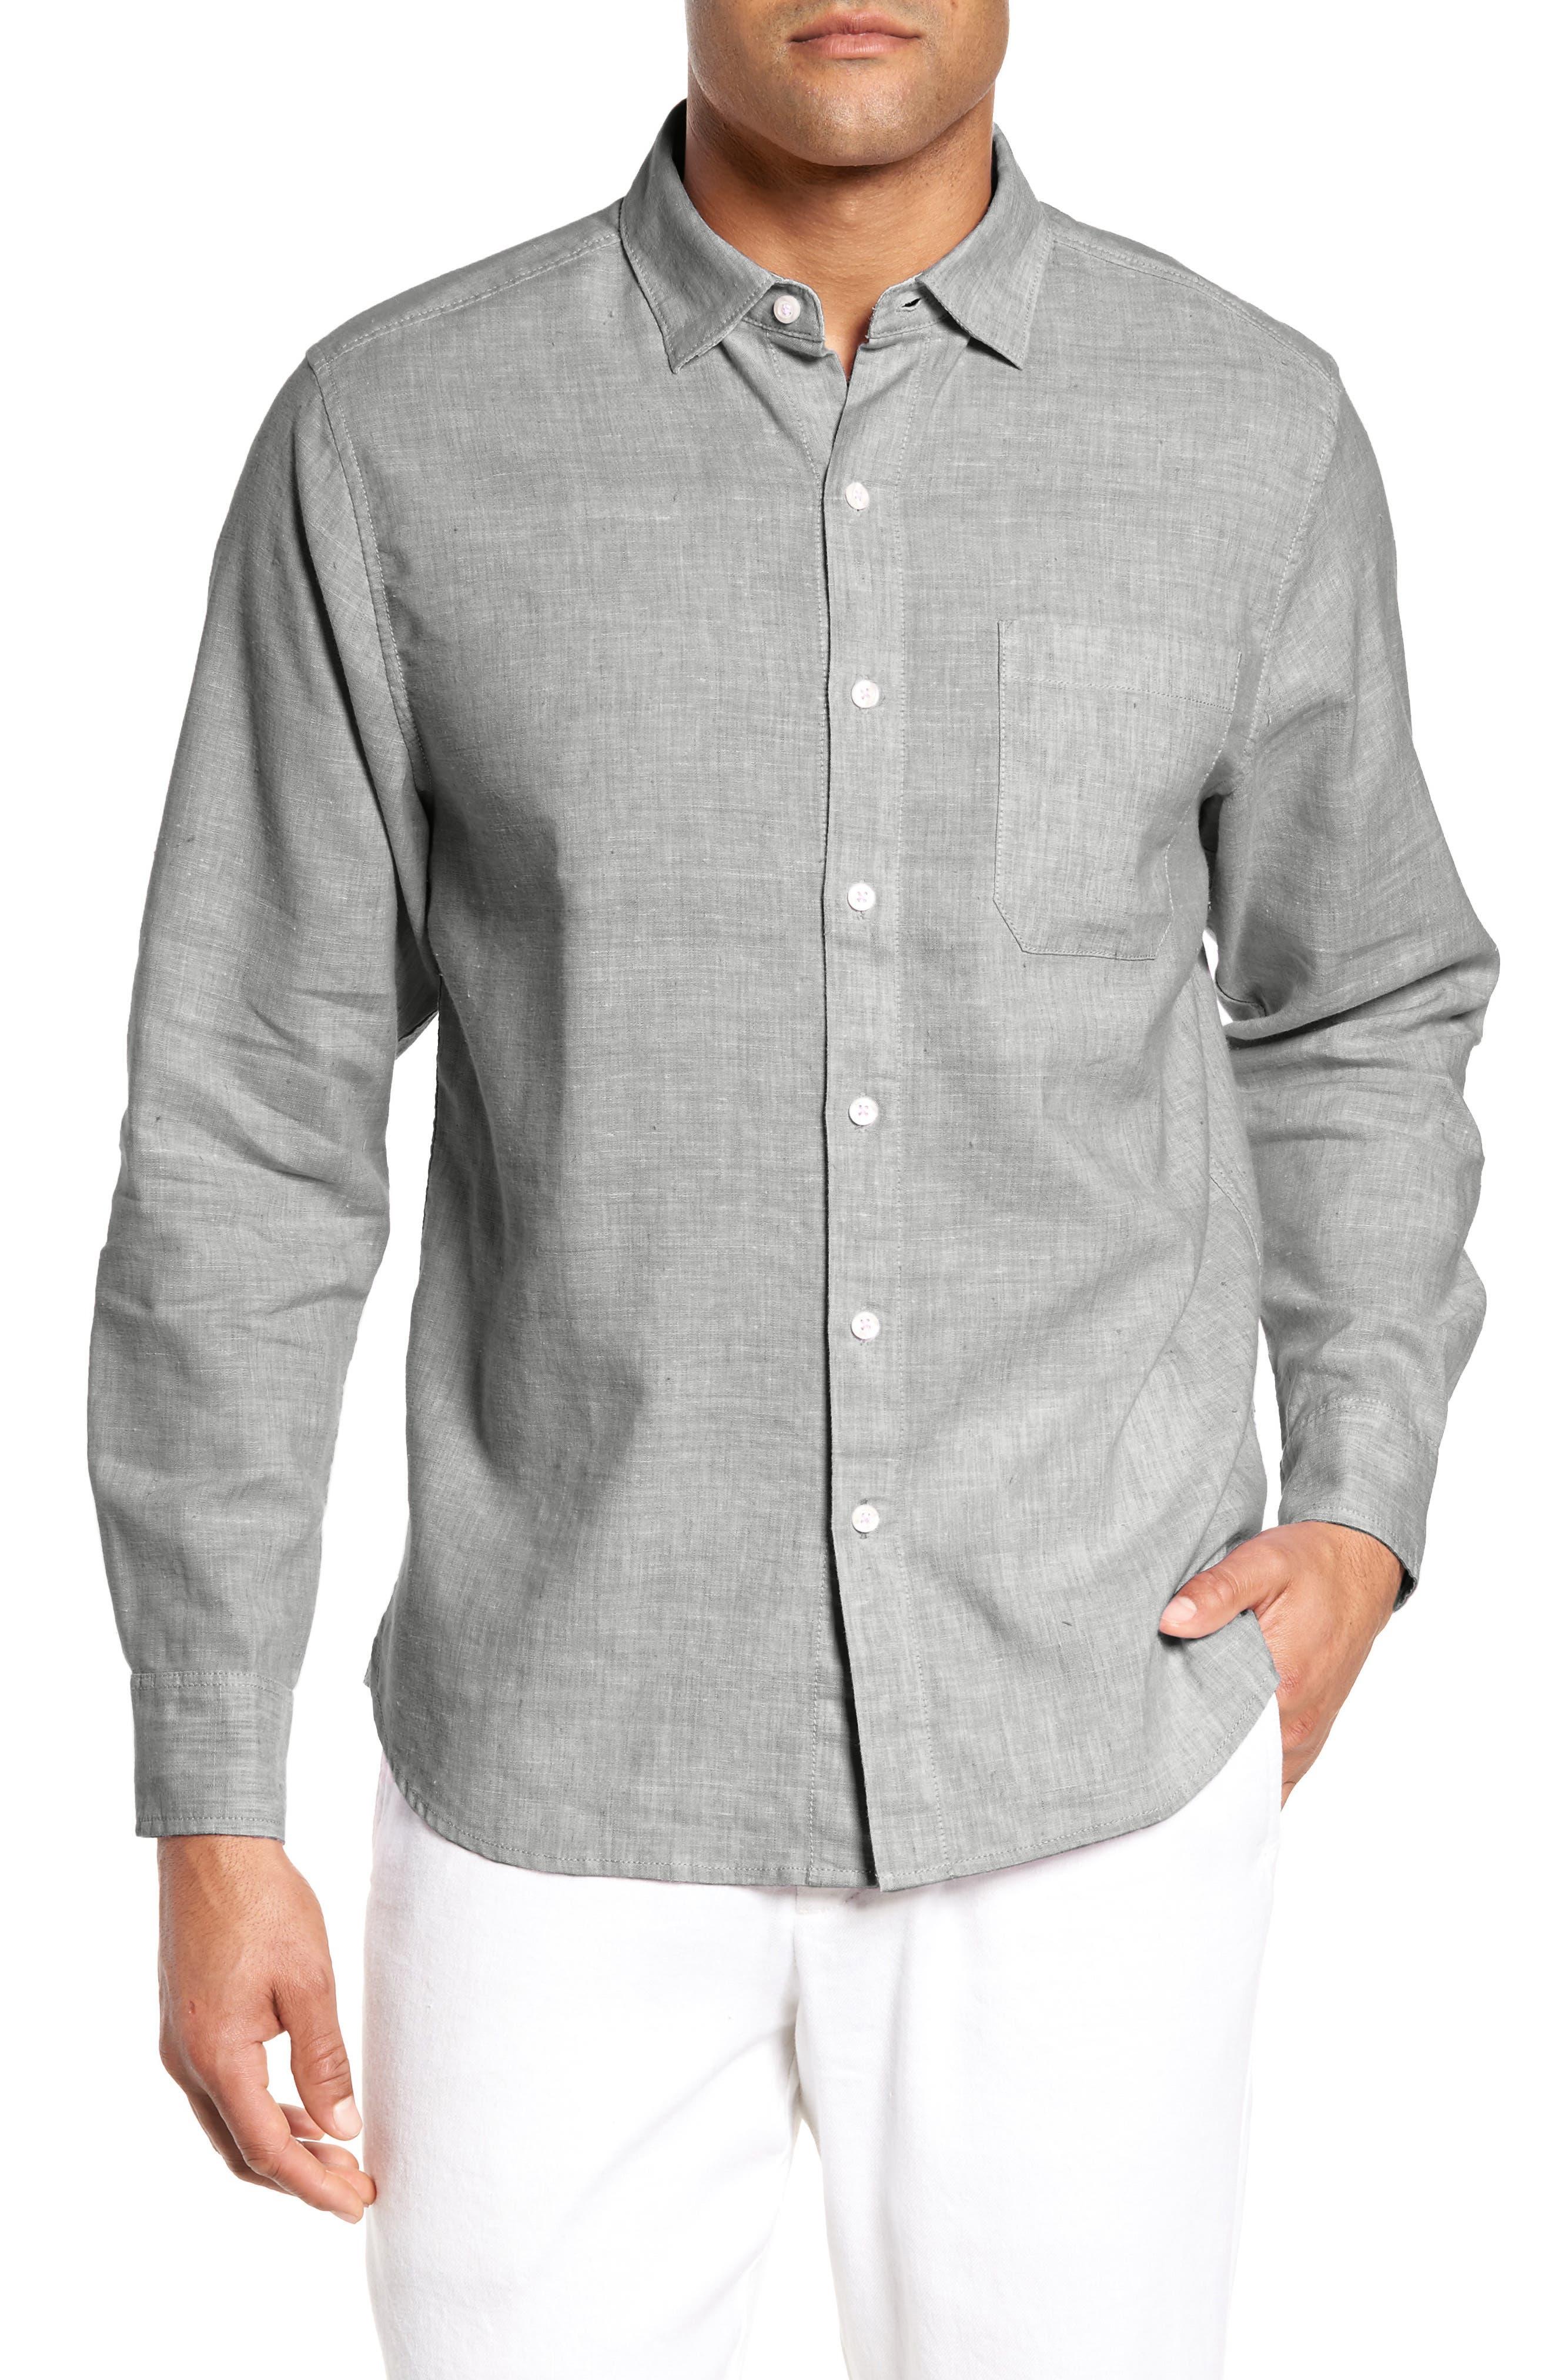 Lanai Tides Regular Fit Linen Blend Sport Shirt,                             Main thumbnail 1, color,                             Smoke Grey